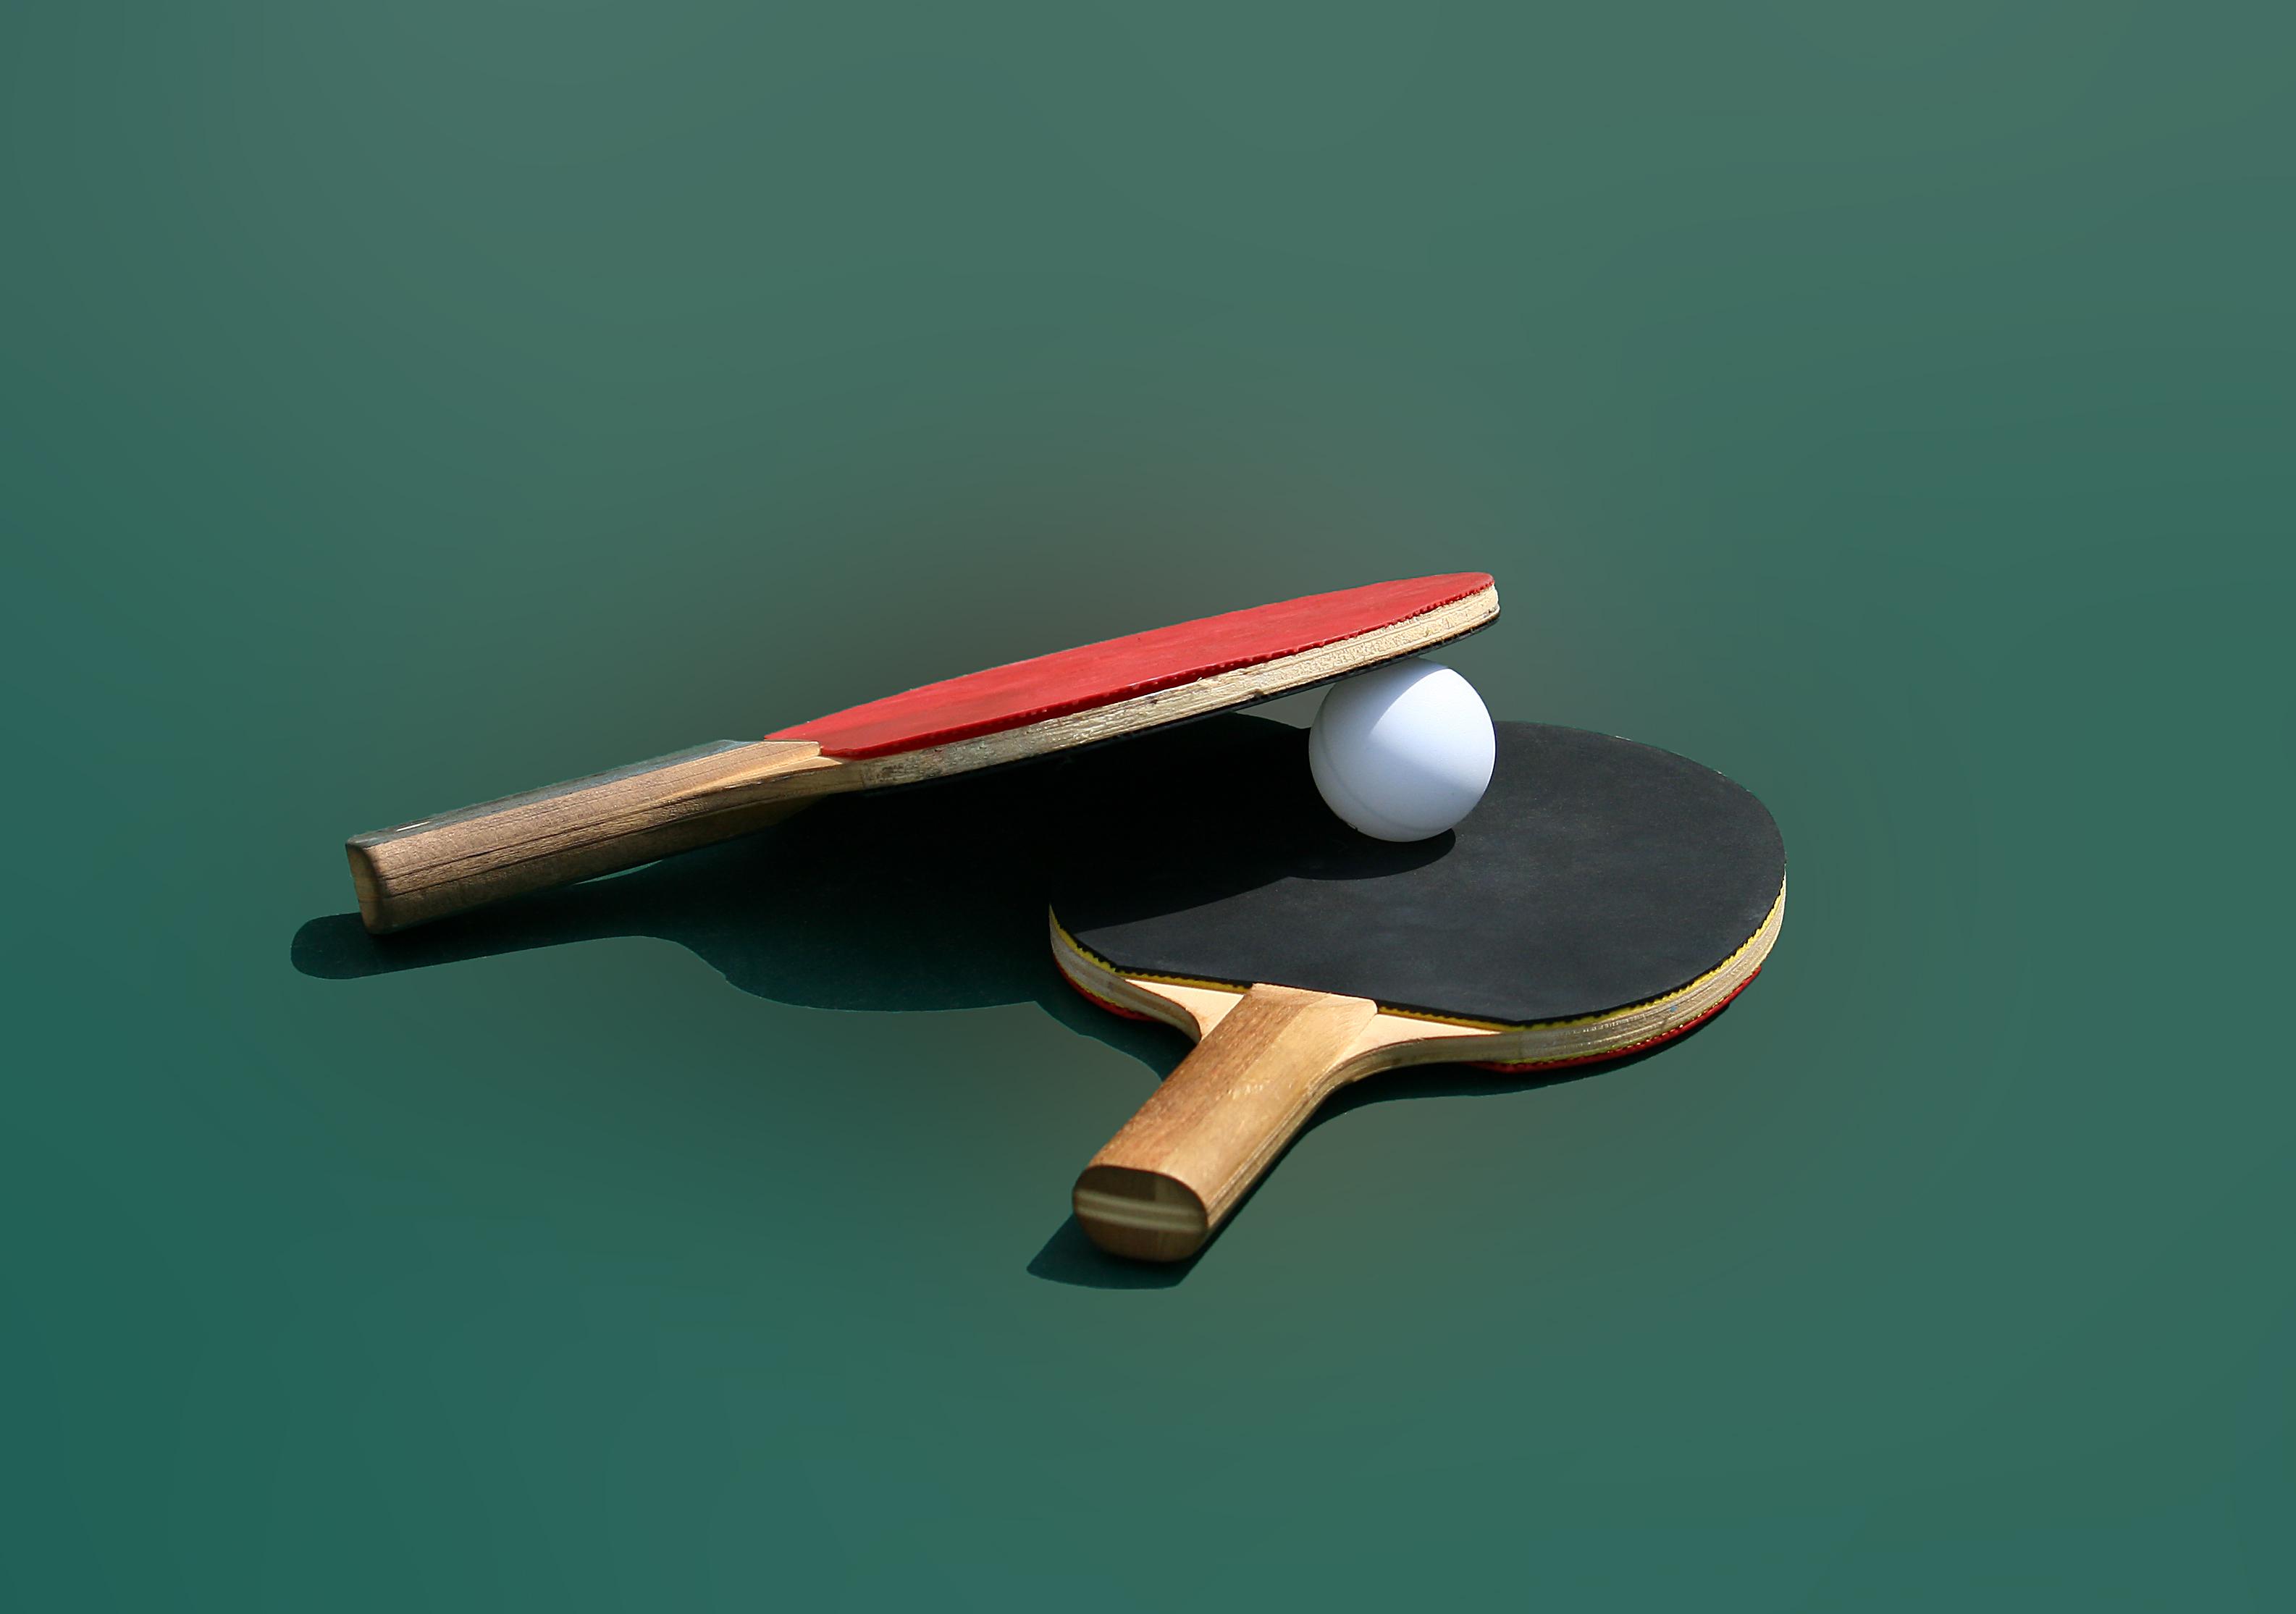 Table Tennis Rackets.jpg